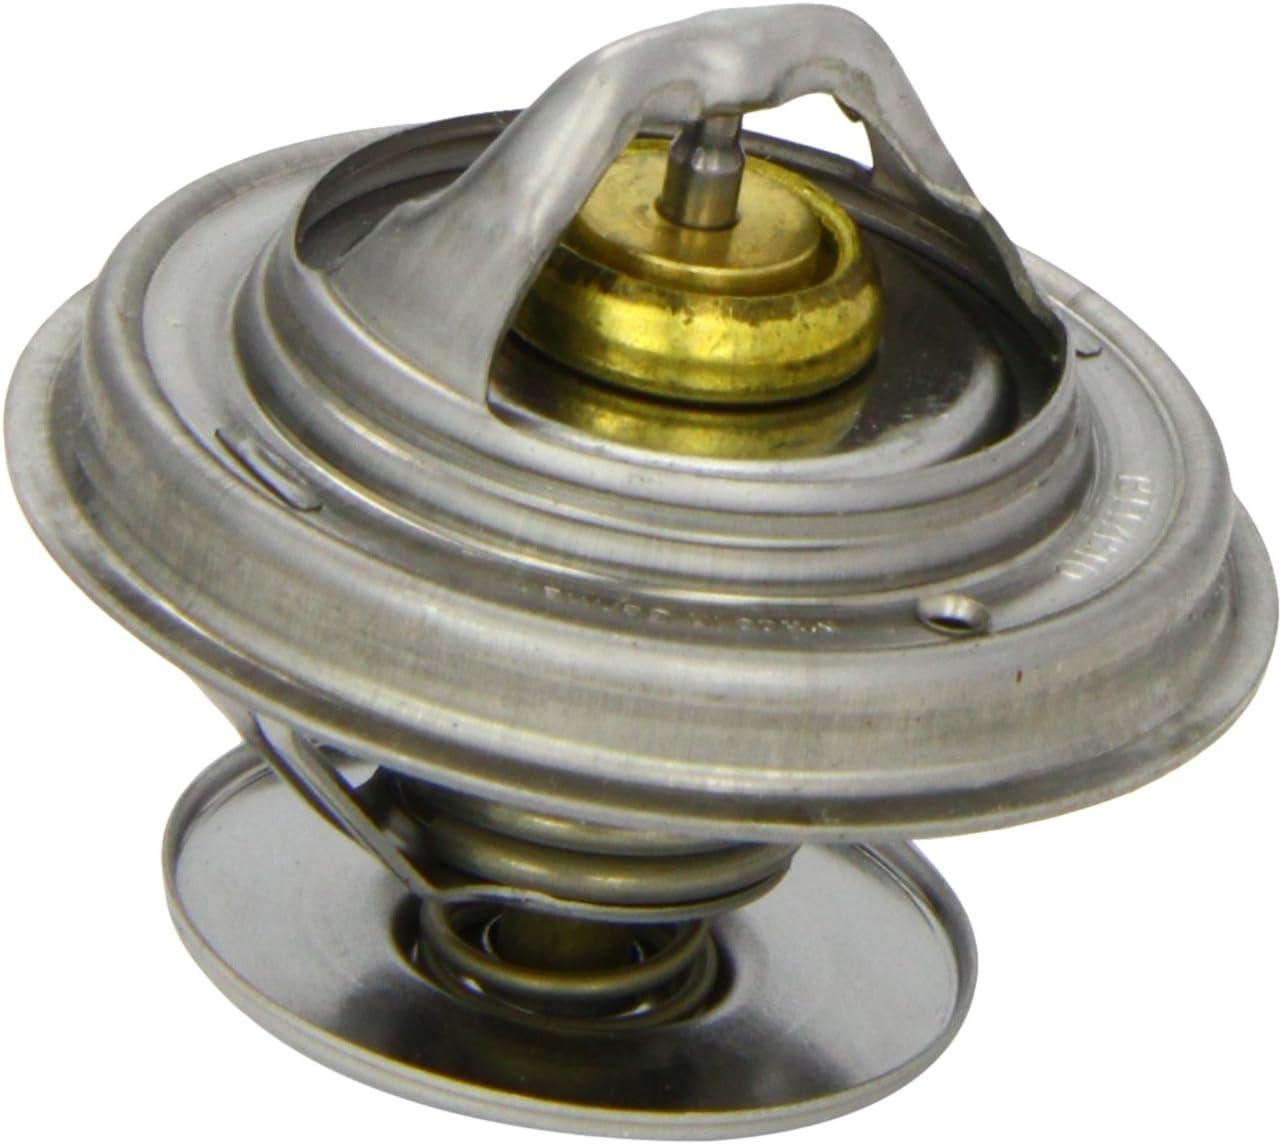 Behr Thermot-Tronik TX 18 65 Thermostat deau